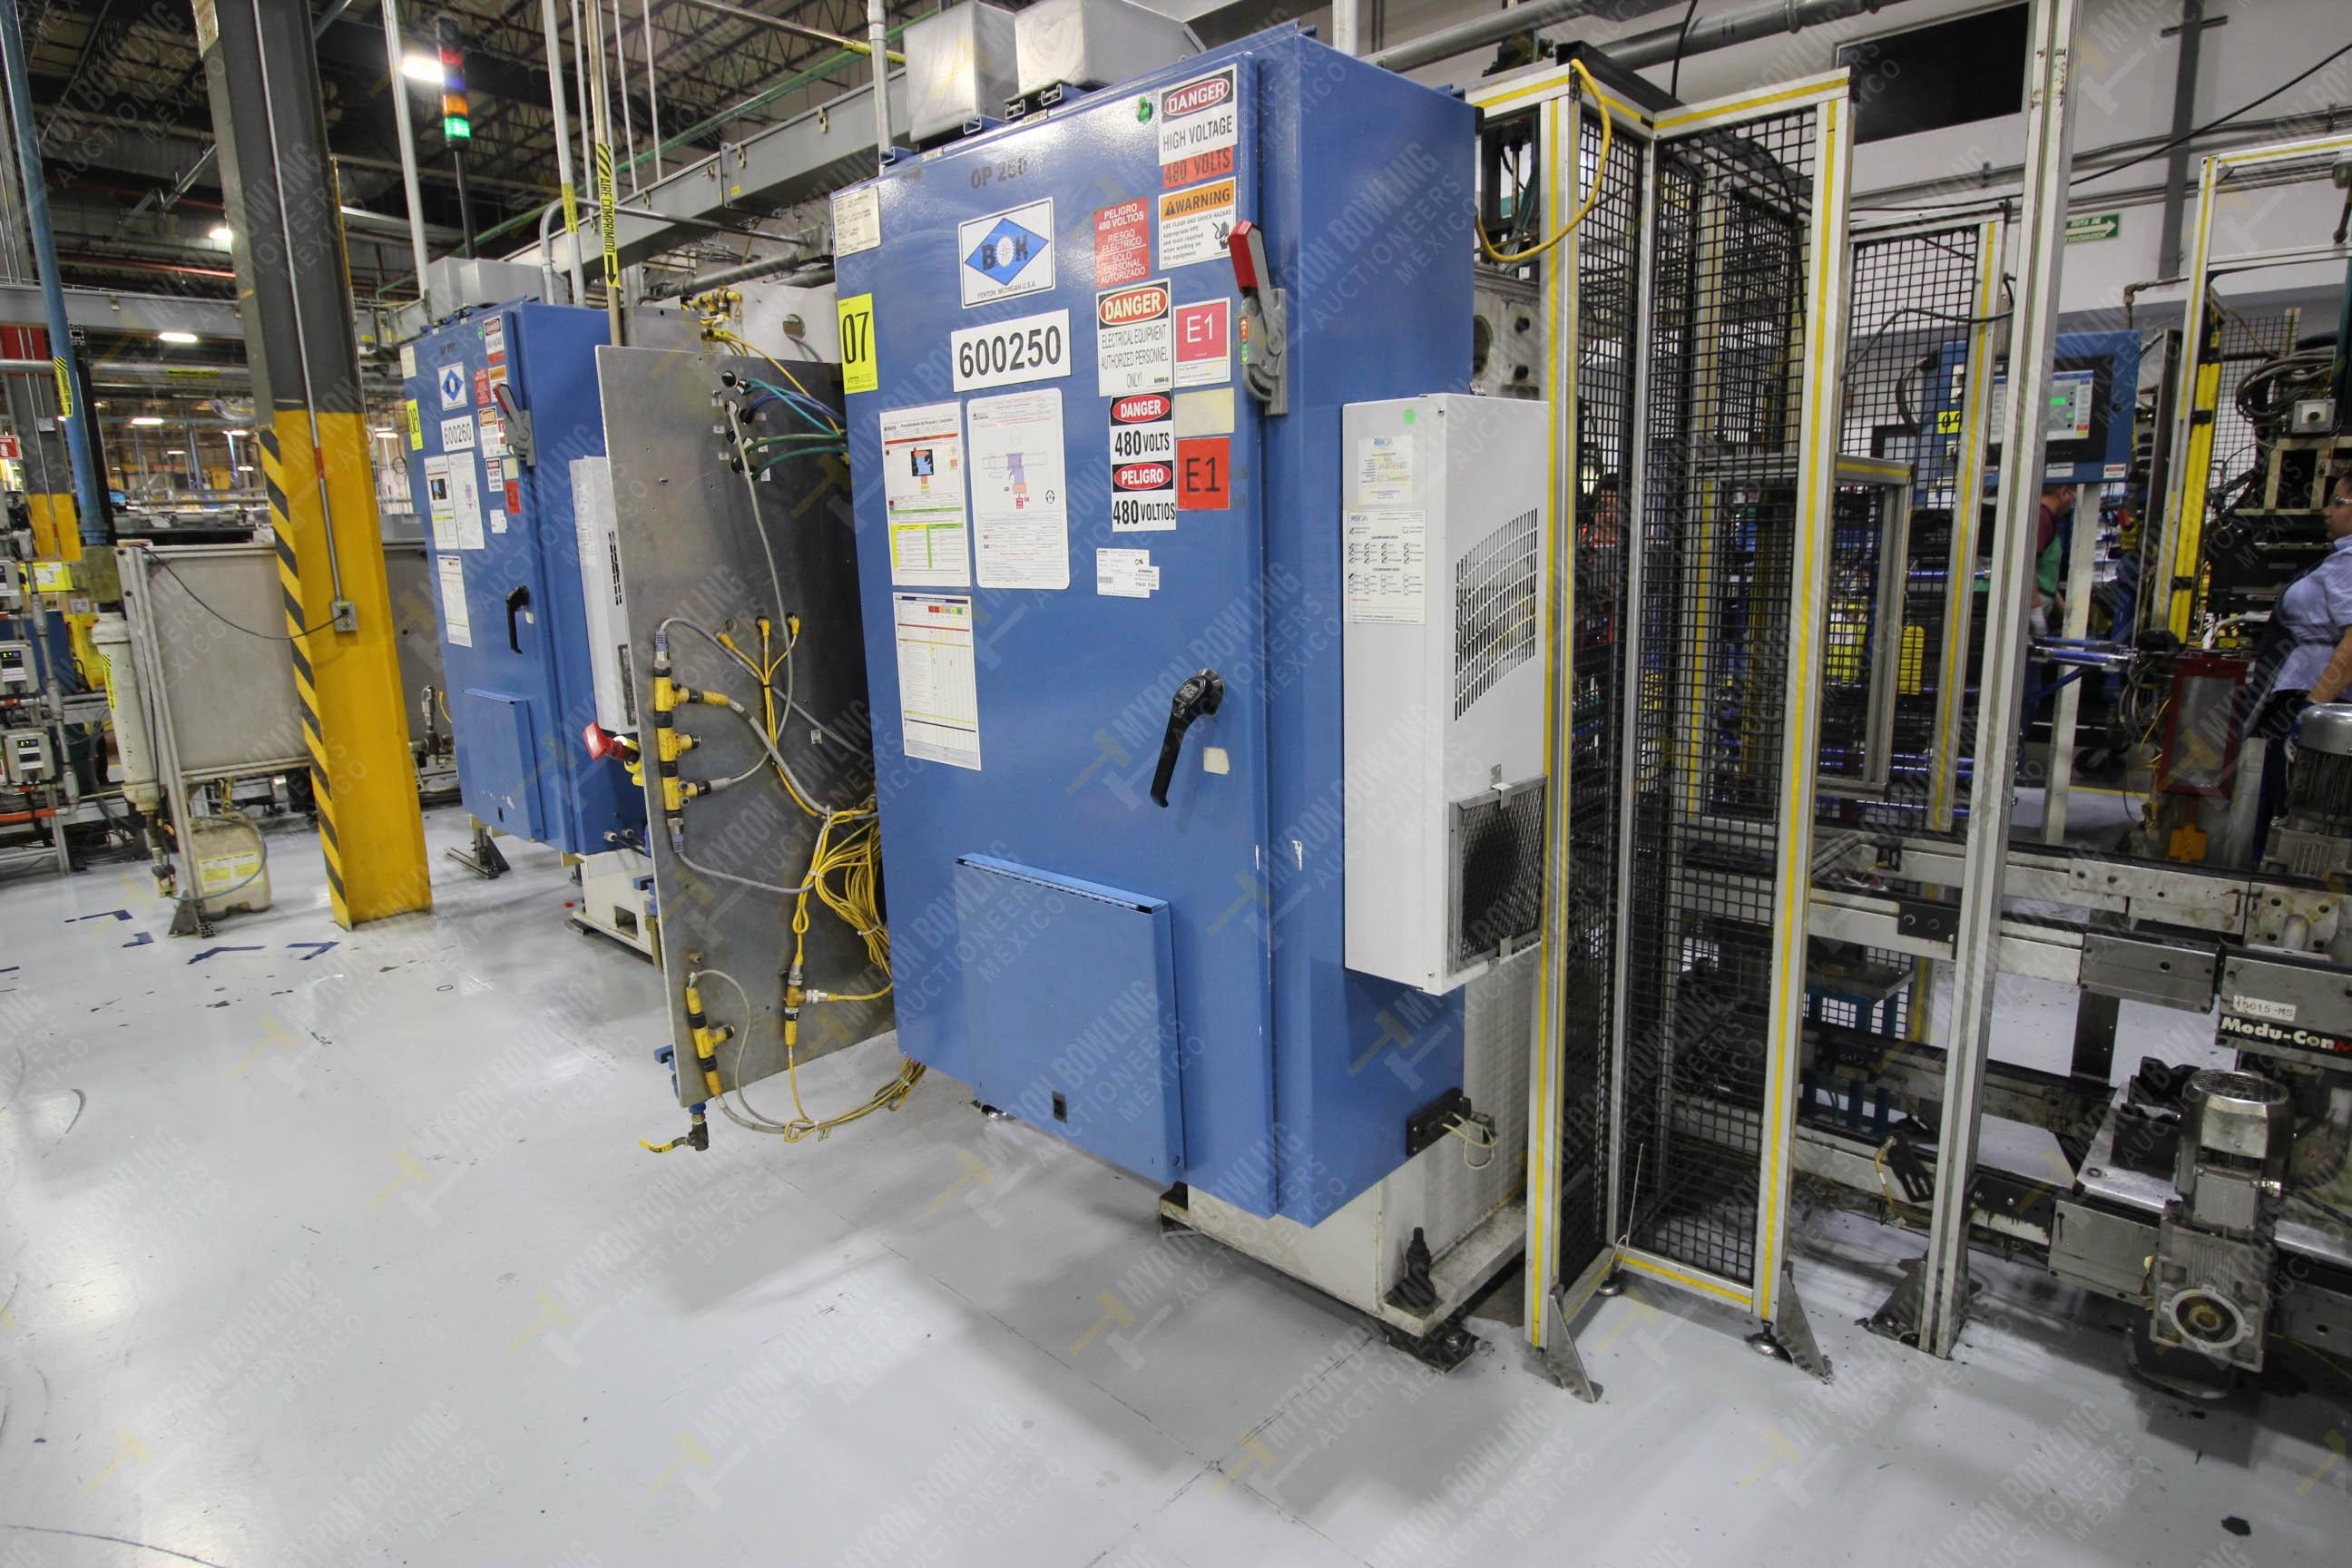 Estación semiautomática para operación 250 de ensamble de candado, contiene - Image 19 of 21